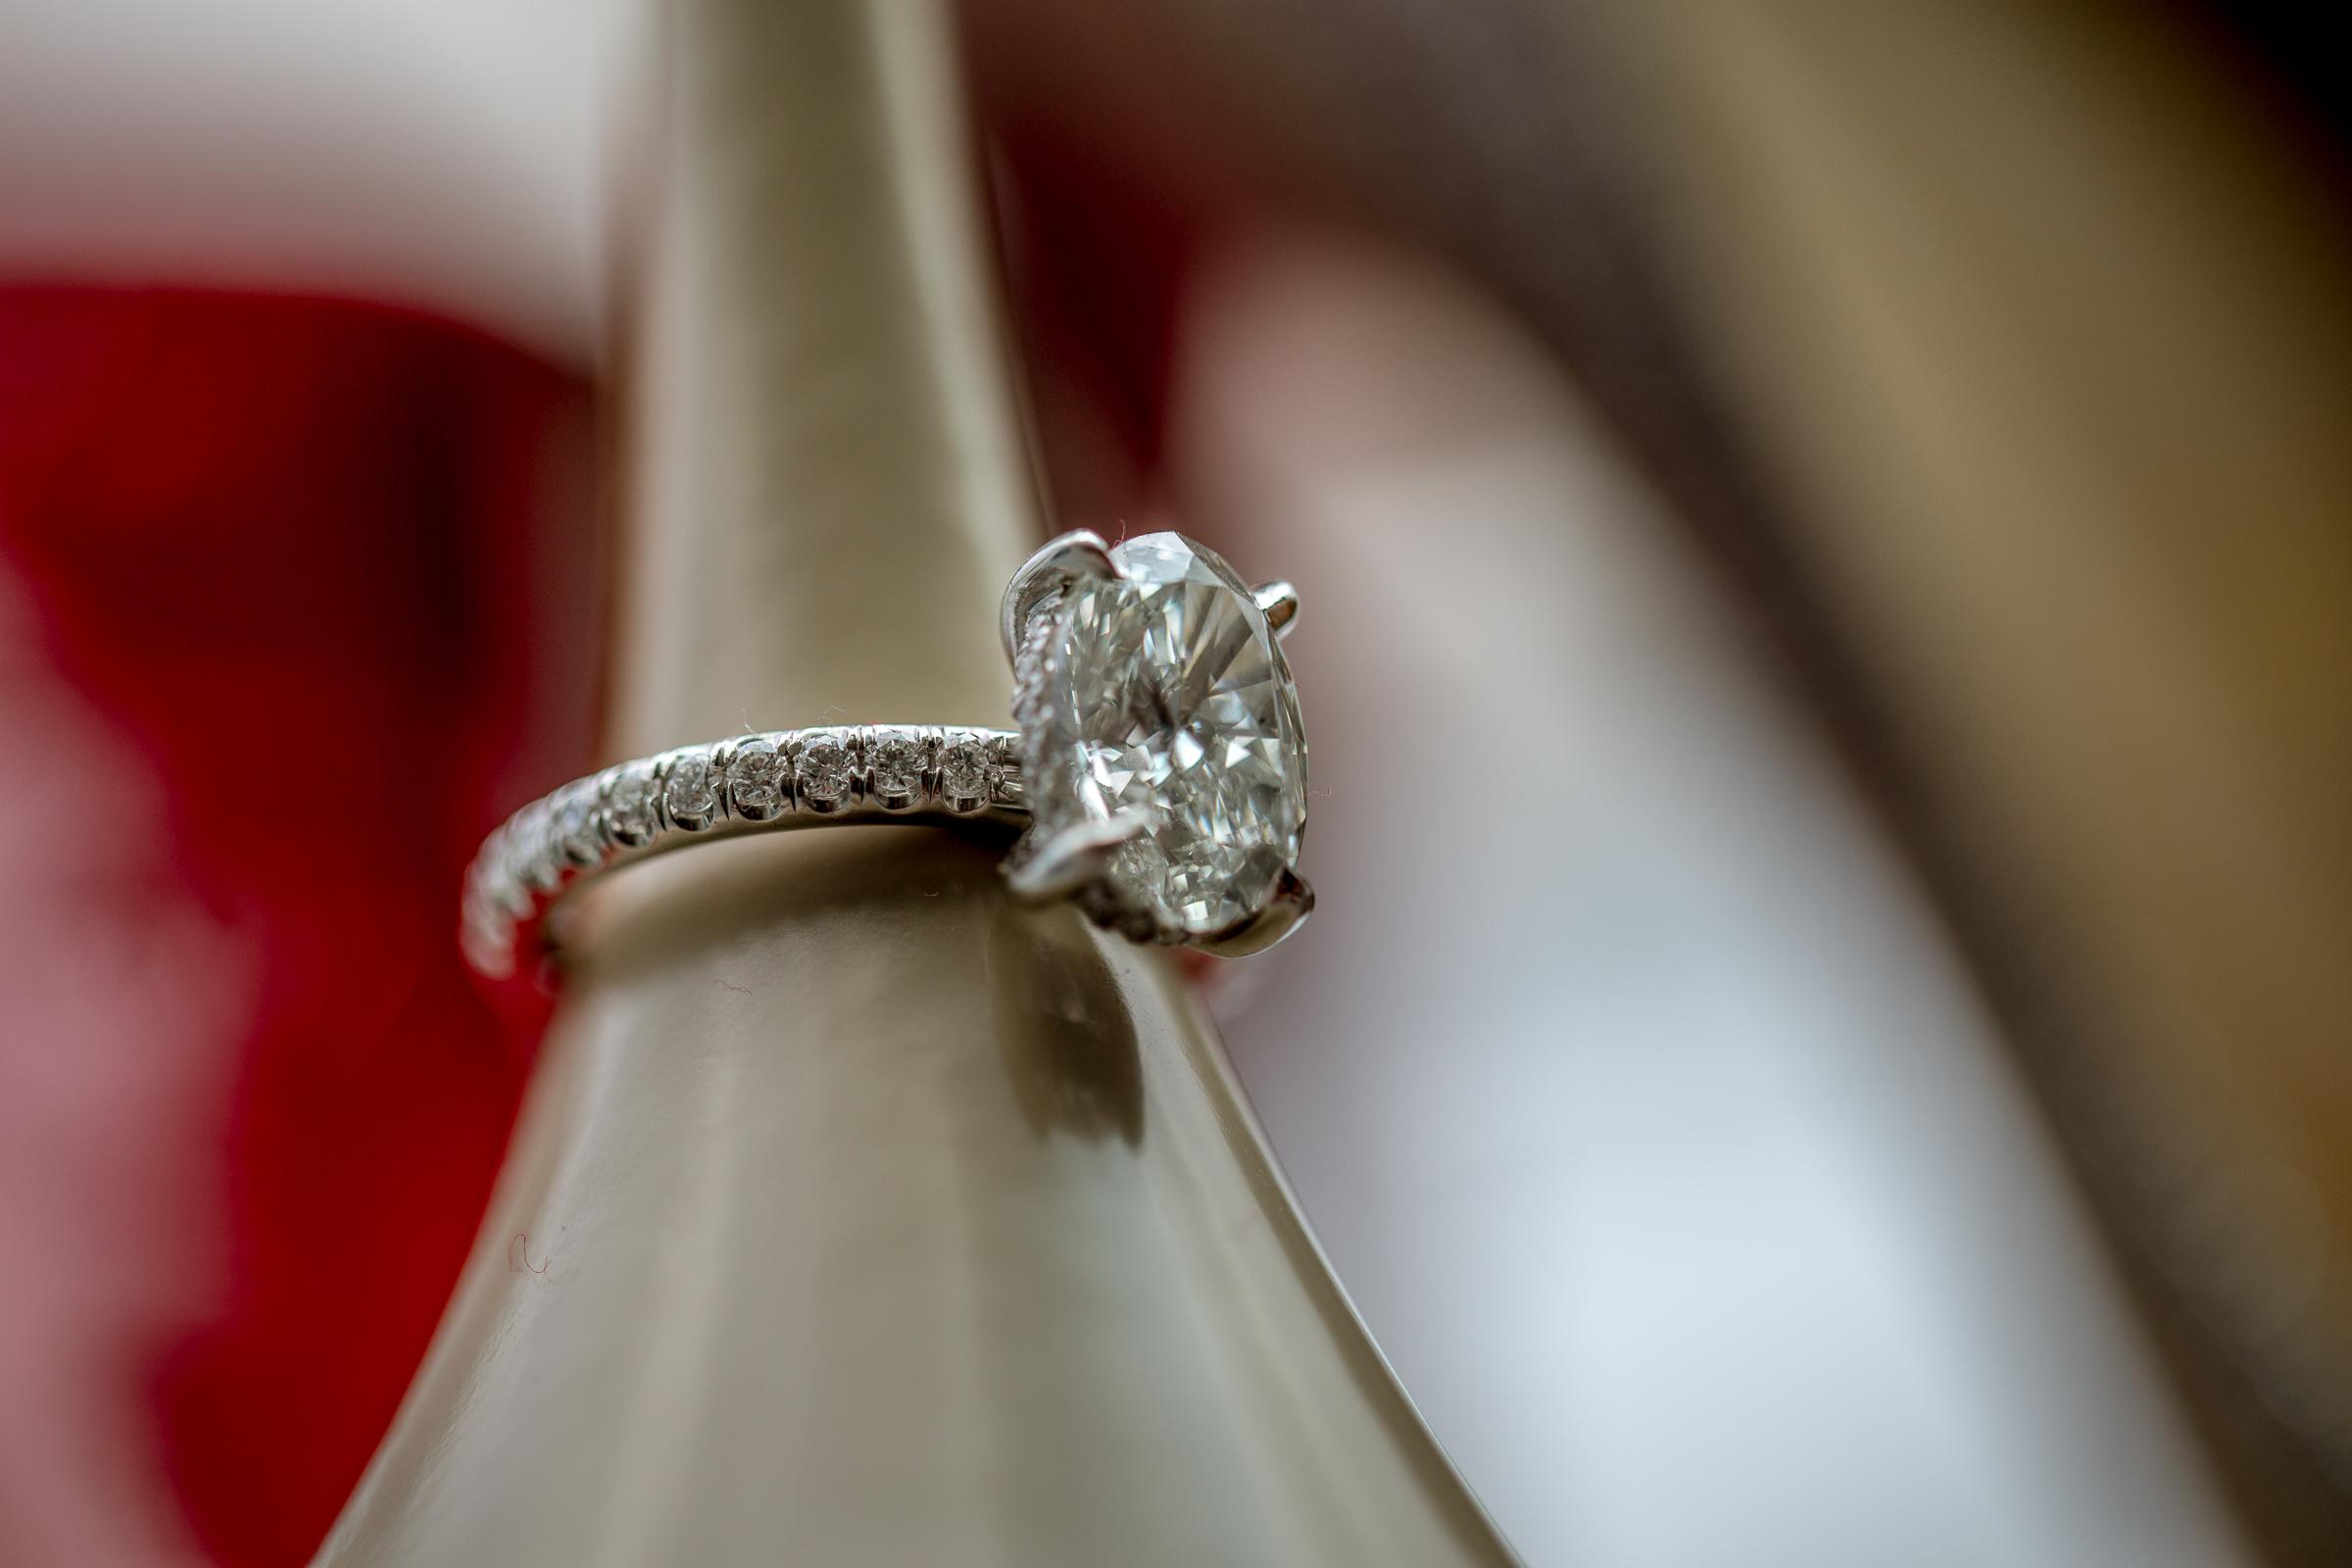 engagement ring around heel of shoe